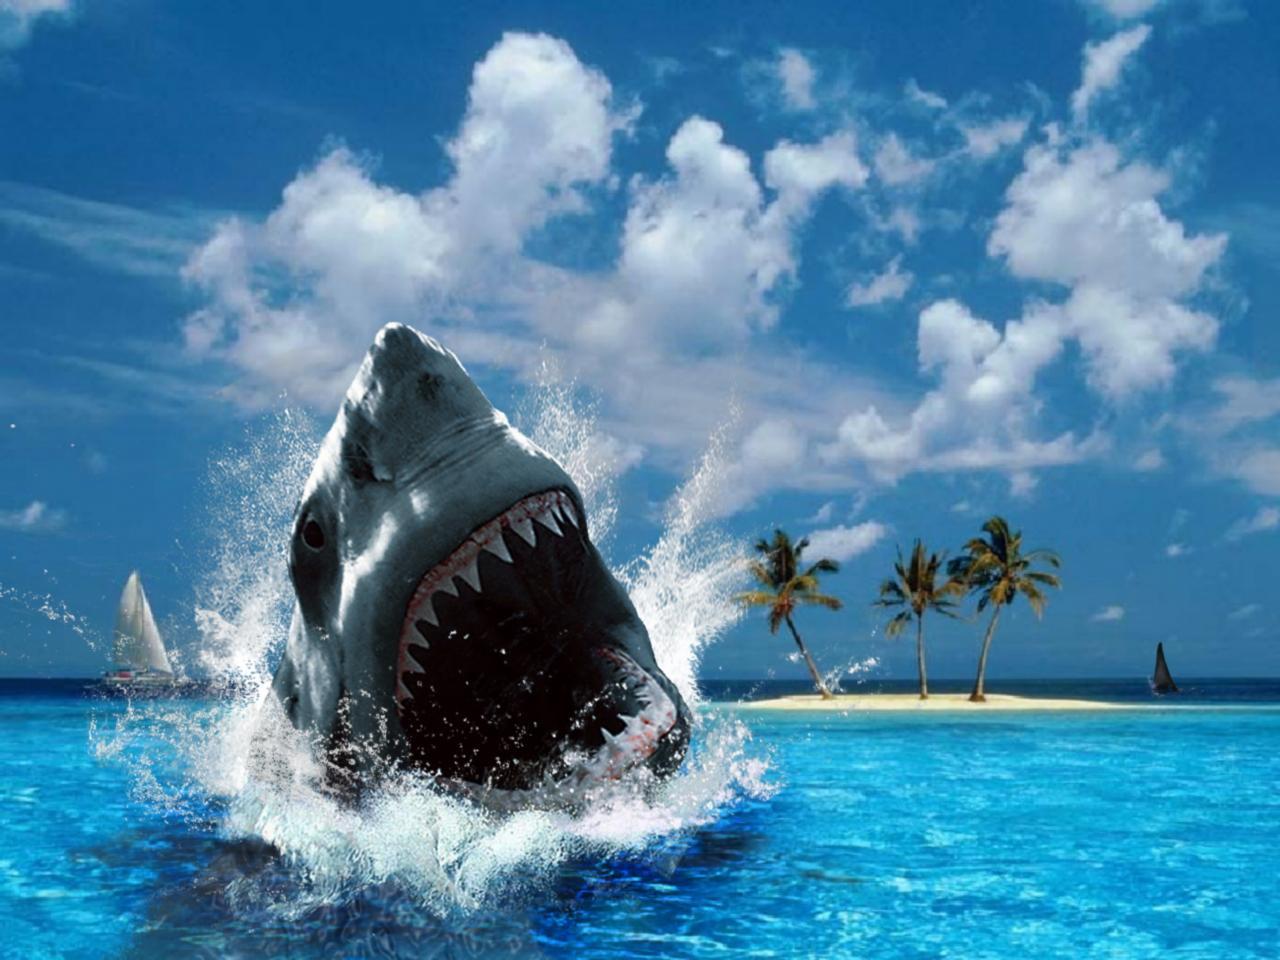 Shark Wallpapers with sea backgrounds suitable for adventures desktop 1280x960